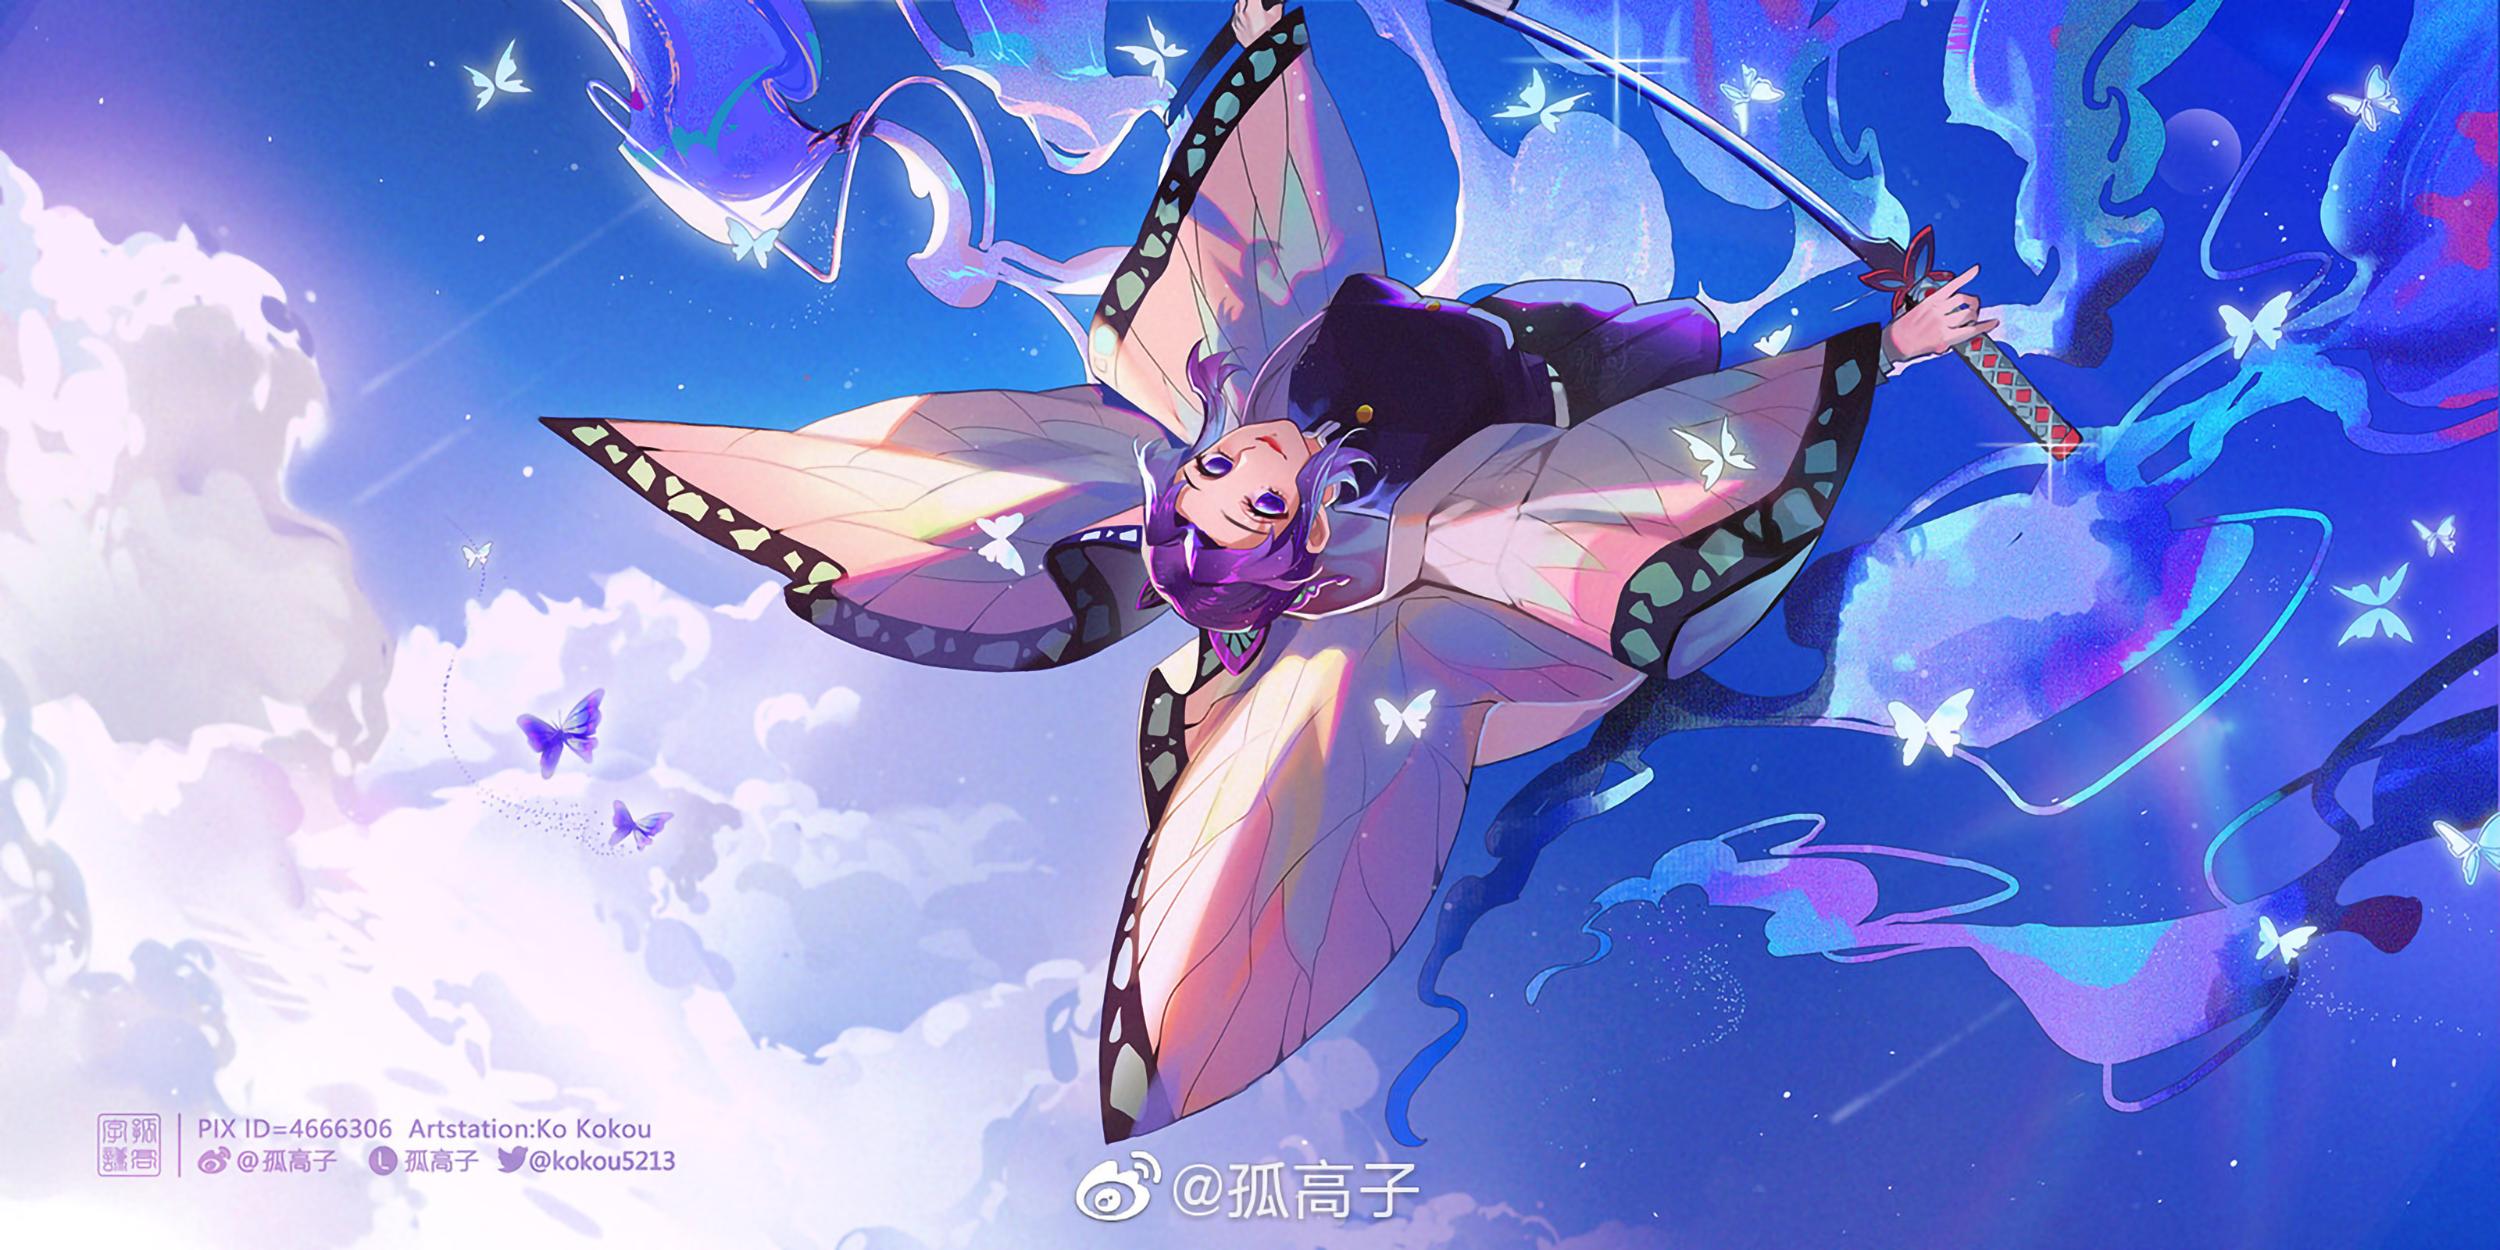 Demon Slayer: Kimetsu no Yaiba HD Wallpaper   Background Image   2500x1250   ID:1043546 ...